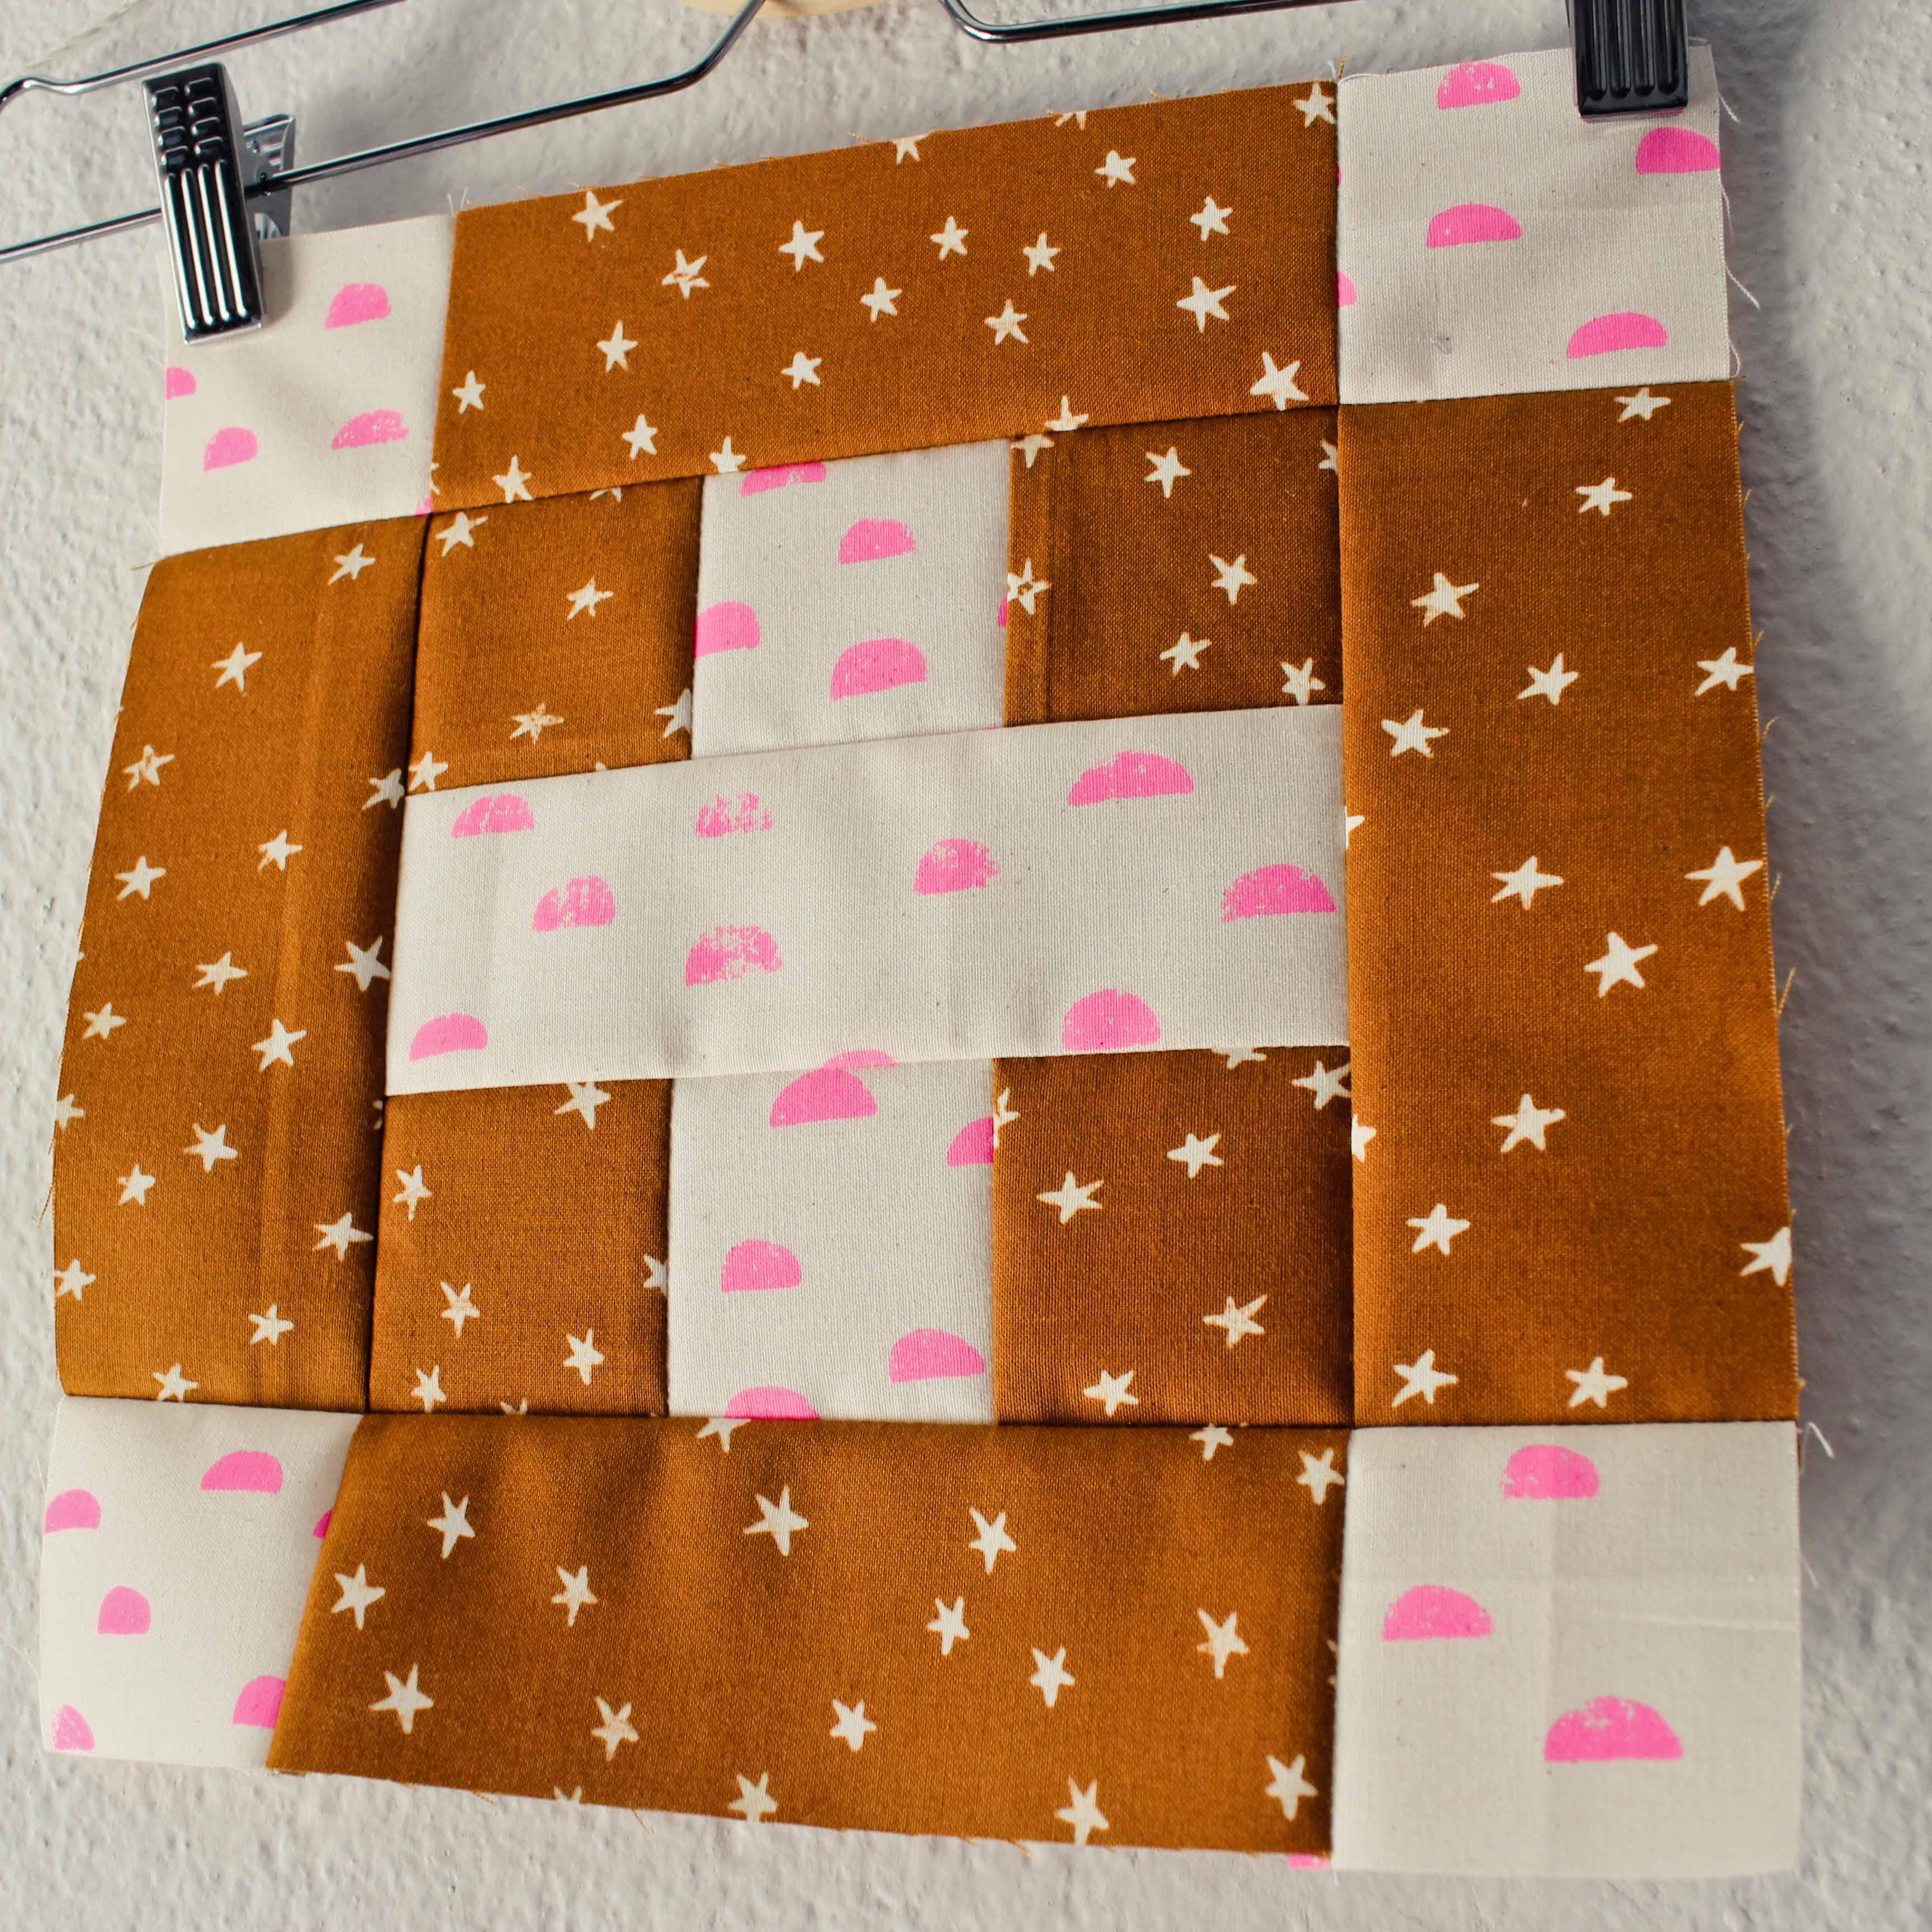 Souvenir of friendship quilt block